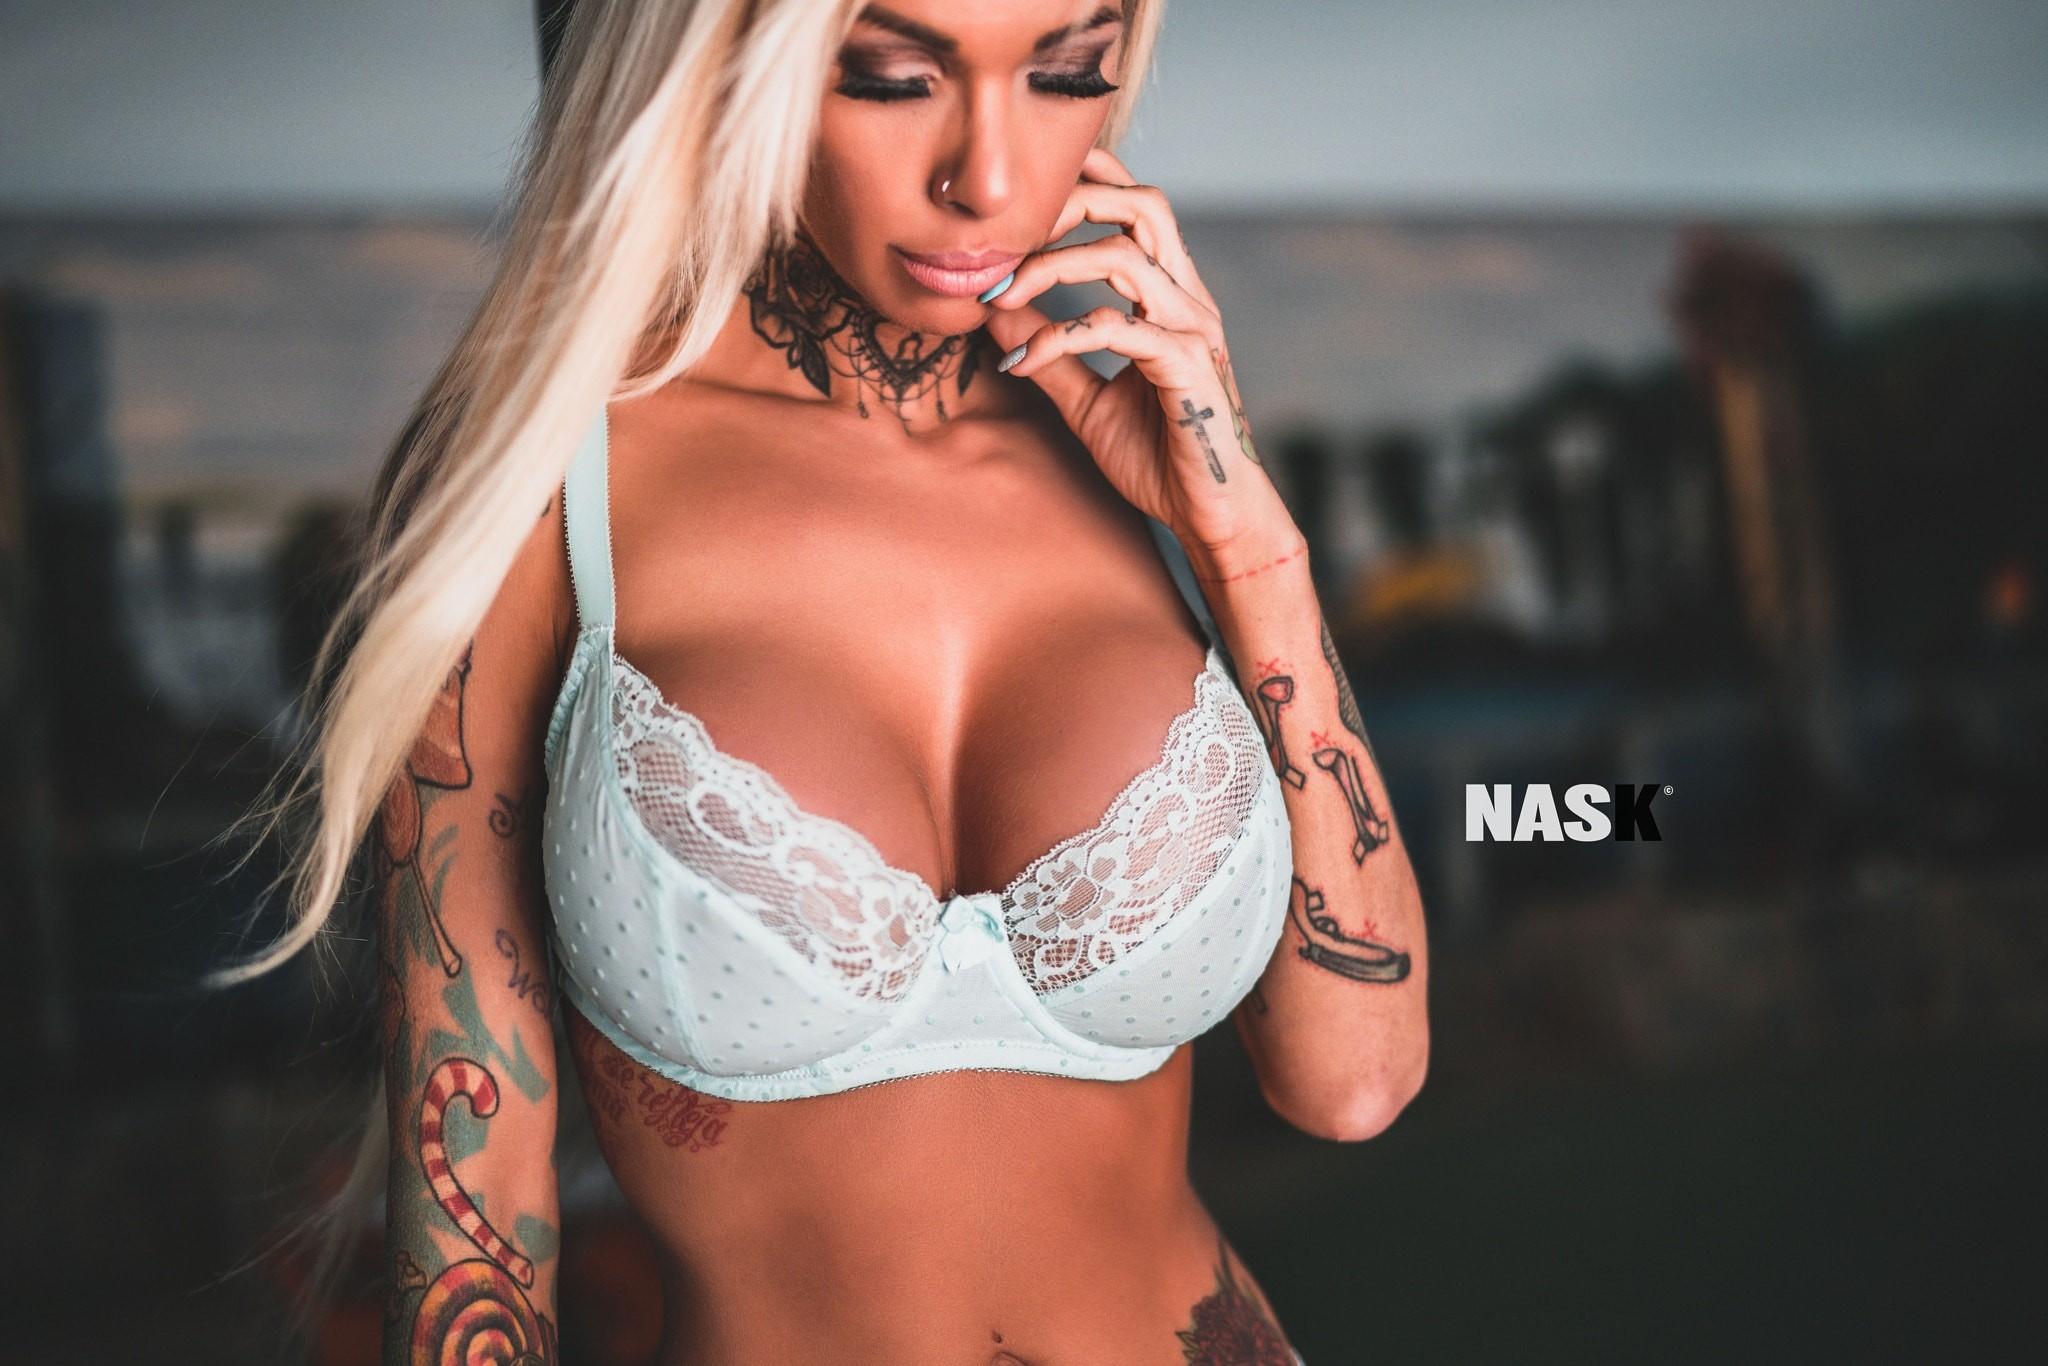 People 2048x1366 women blonde white bra tanned Nask Nach tattoo nose rings closed eyes depth of field Chloe Gimenez